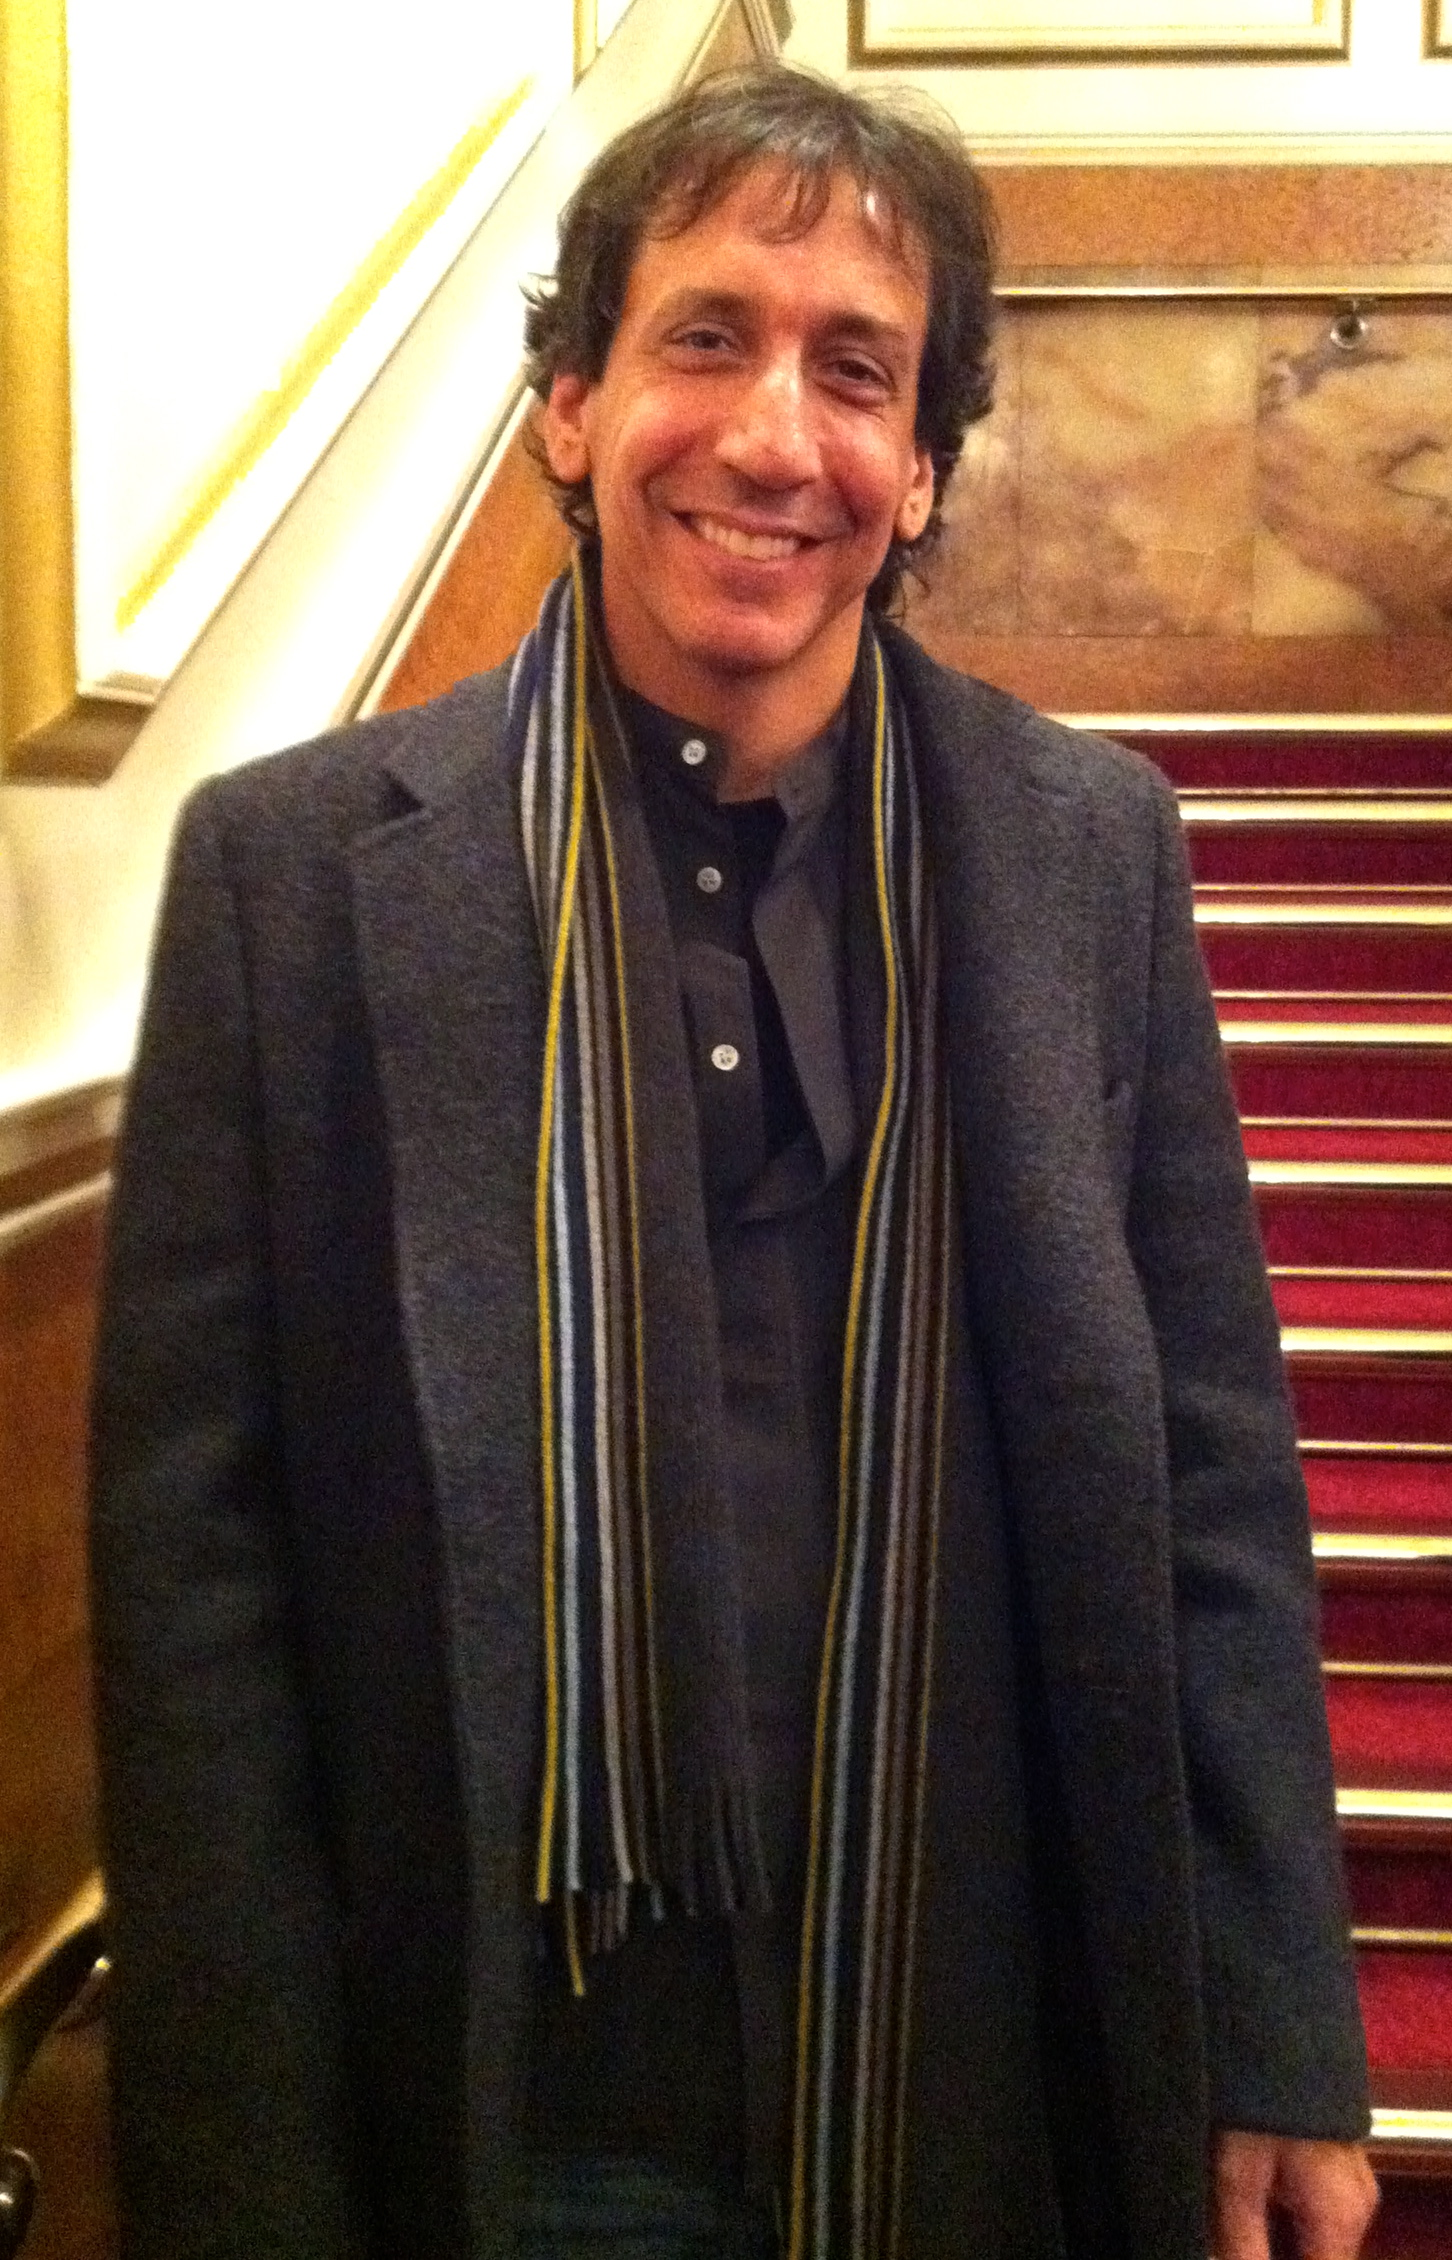 Jeff Atmajian